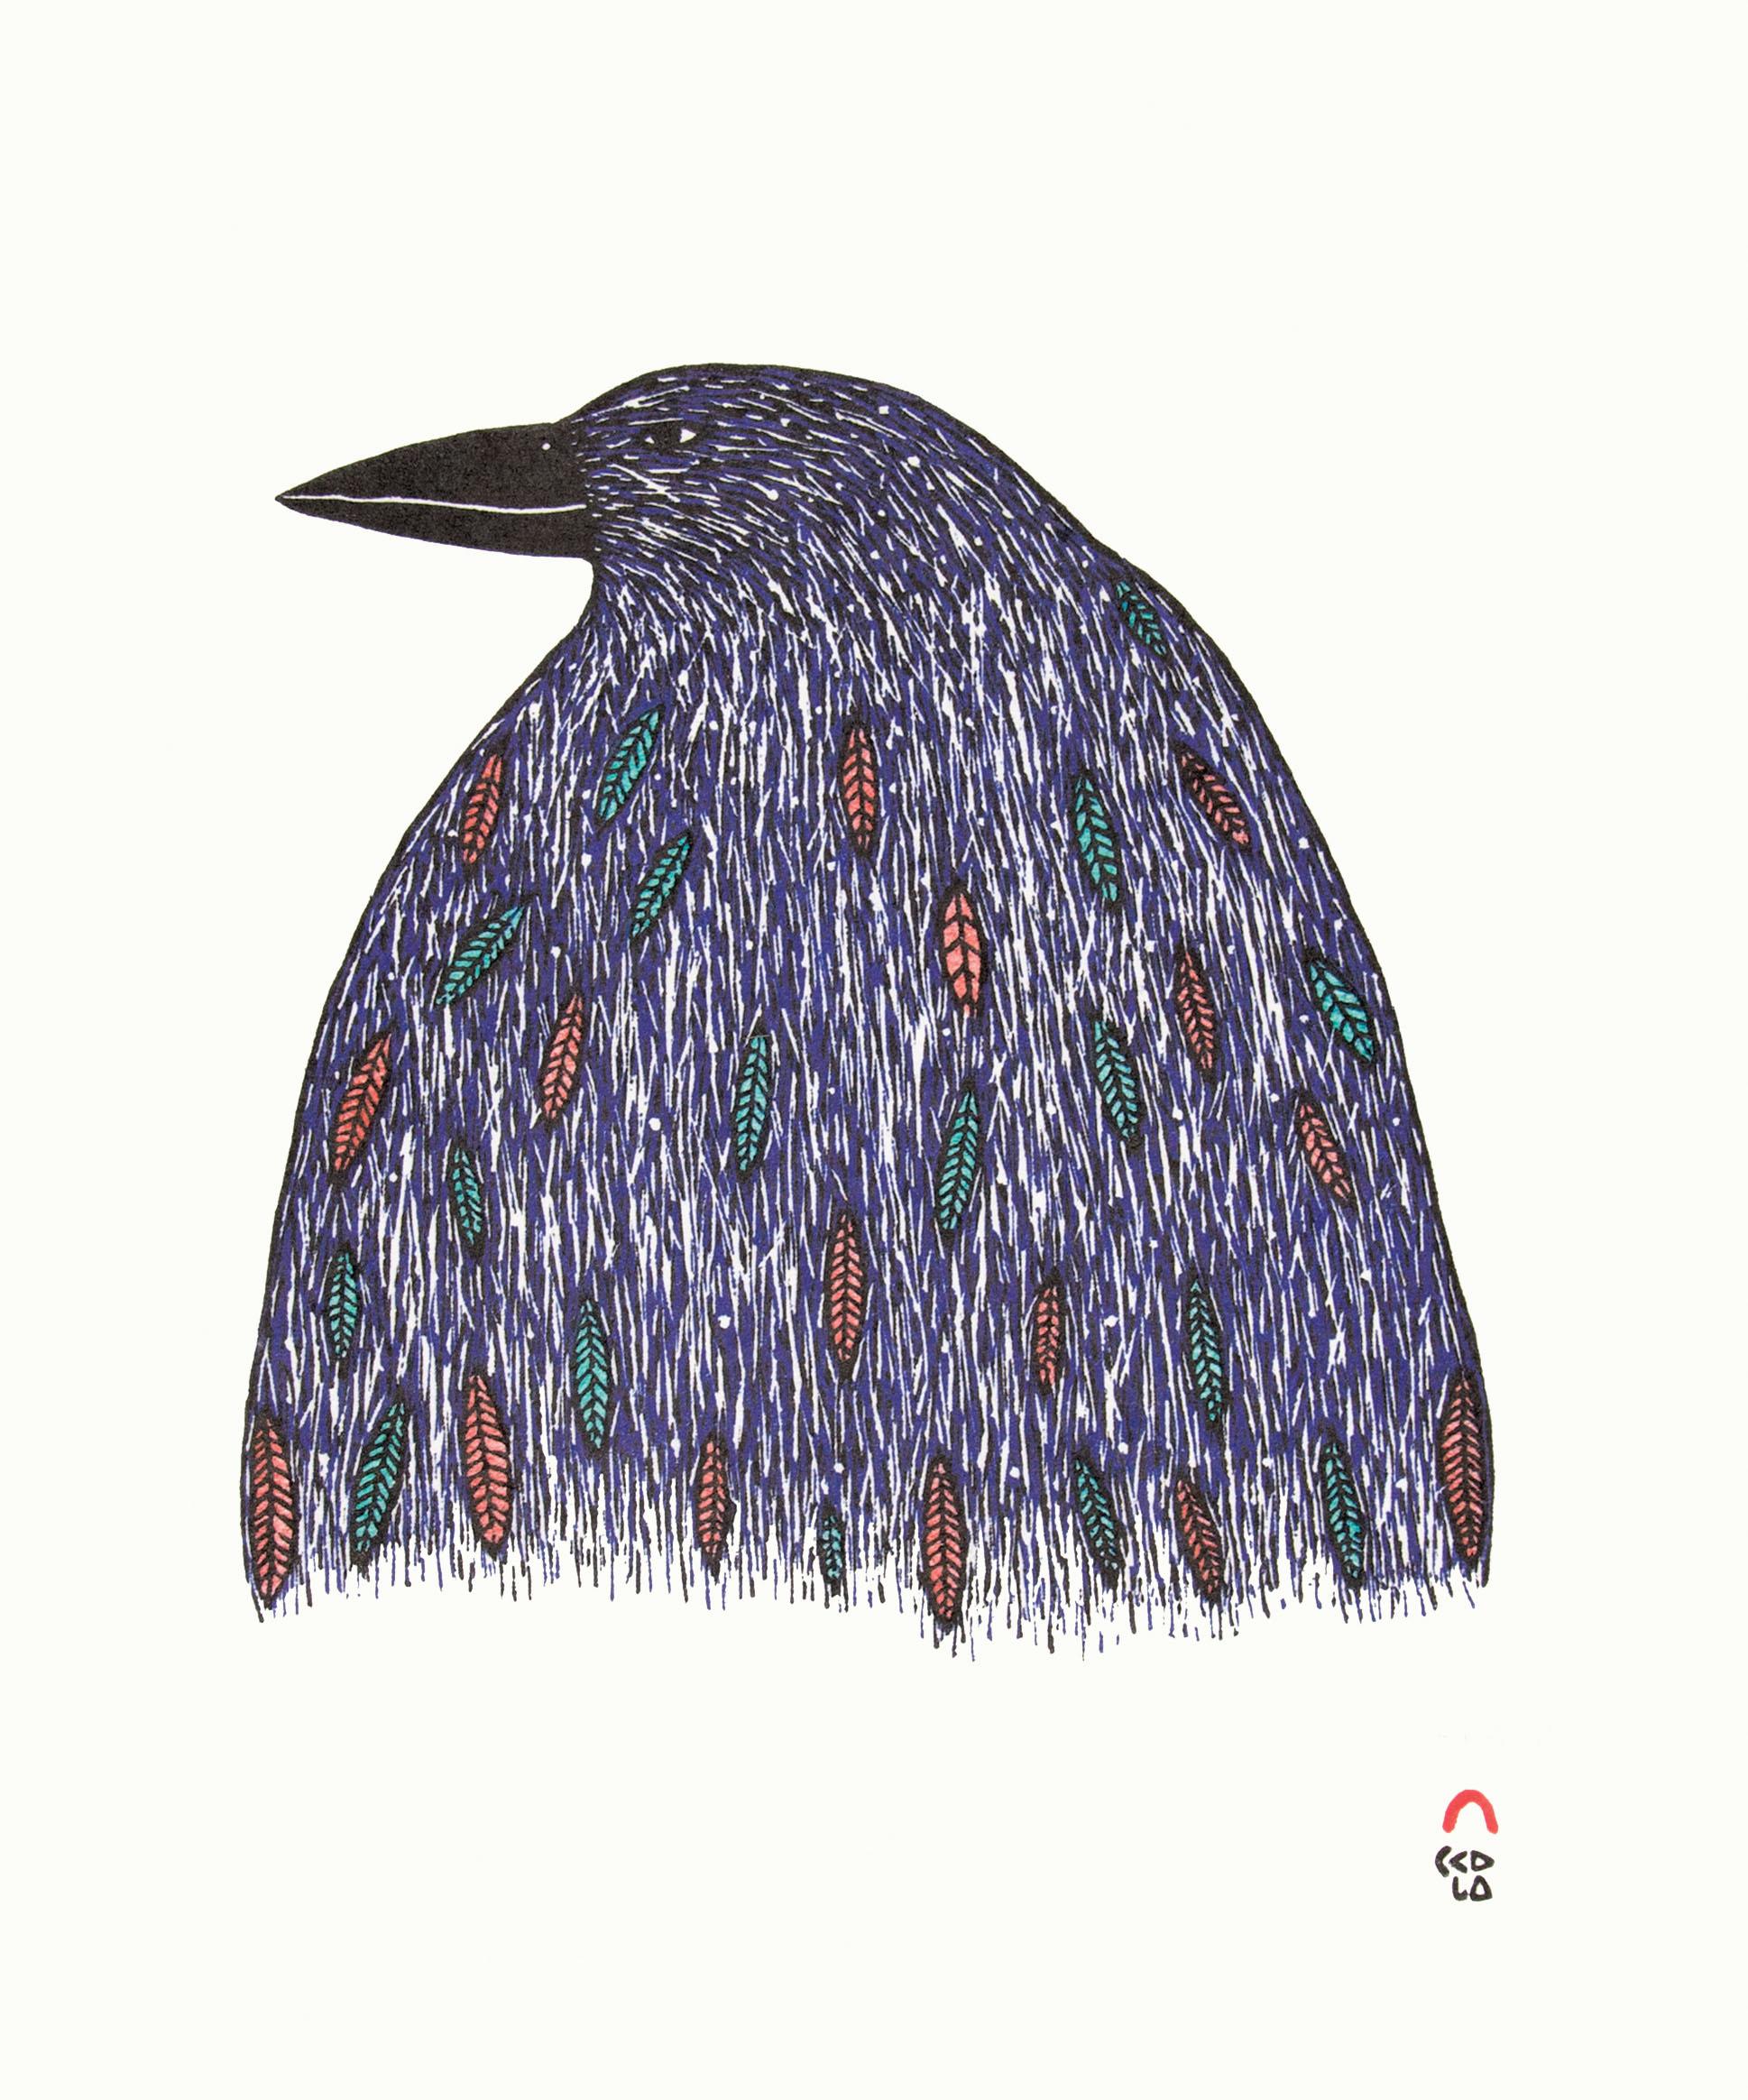 NINGIUKULU TEEVEE Iridescent Raven Stonecut & Stencil Printer: Tapaungai Niviaqsi 35 x 30.5 cm; 13 3/4 x 12 in. $400 US